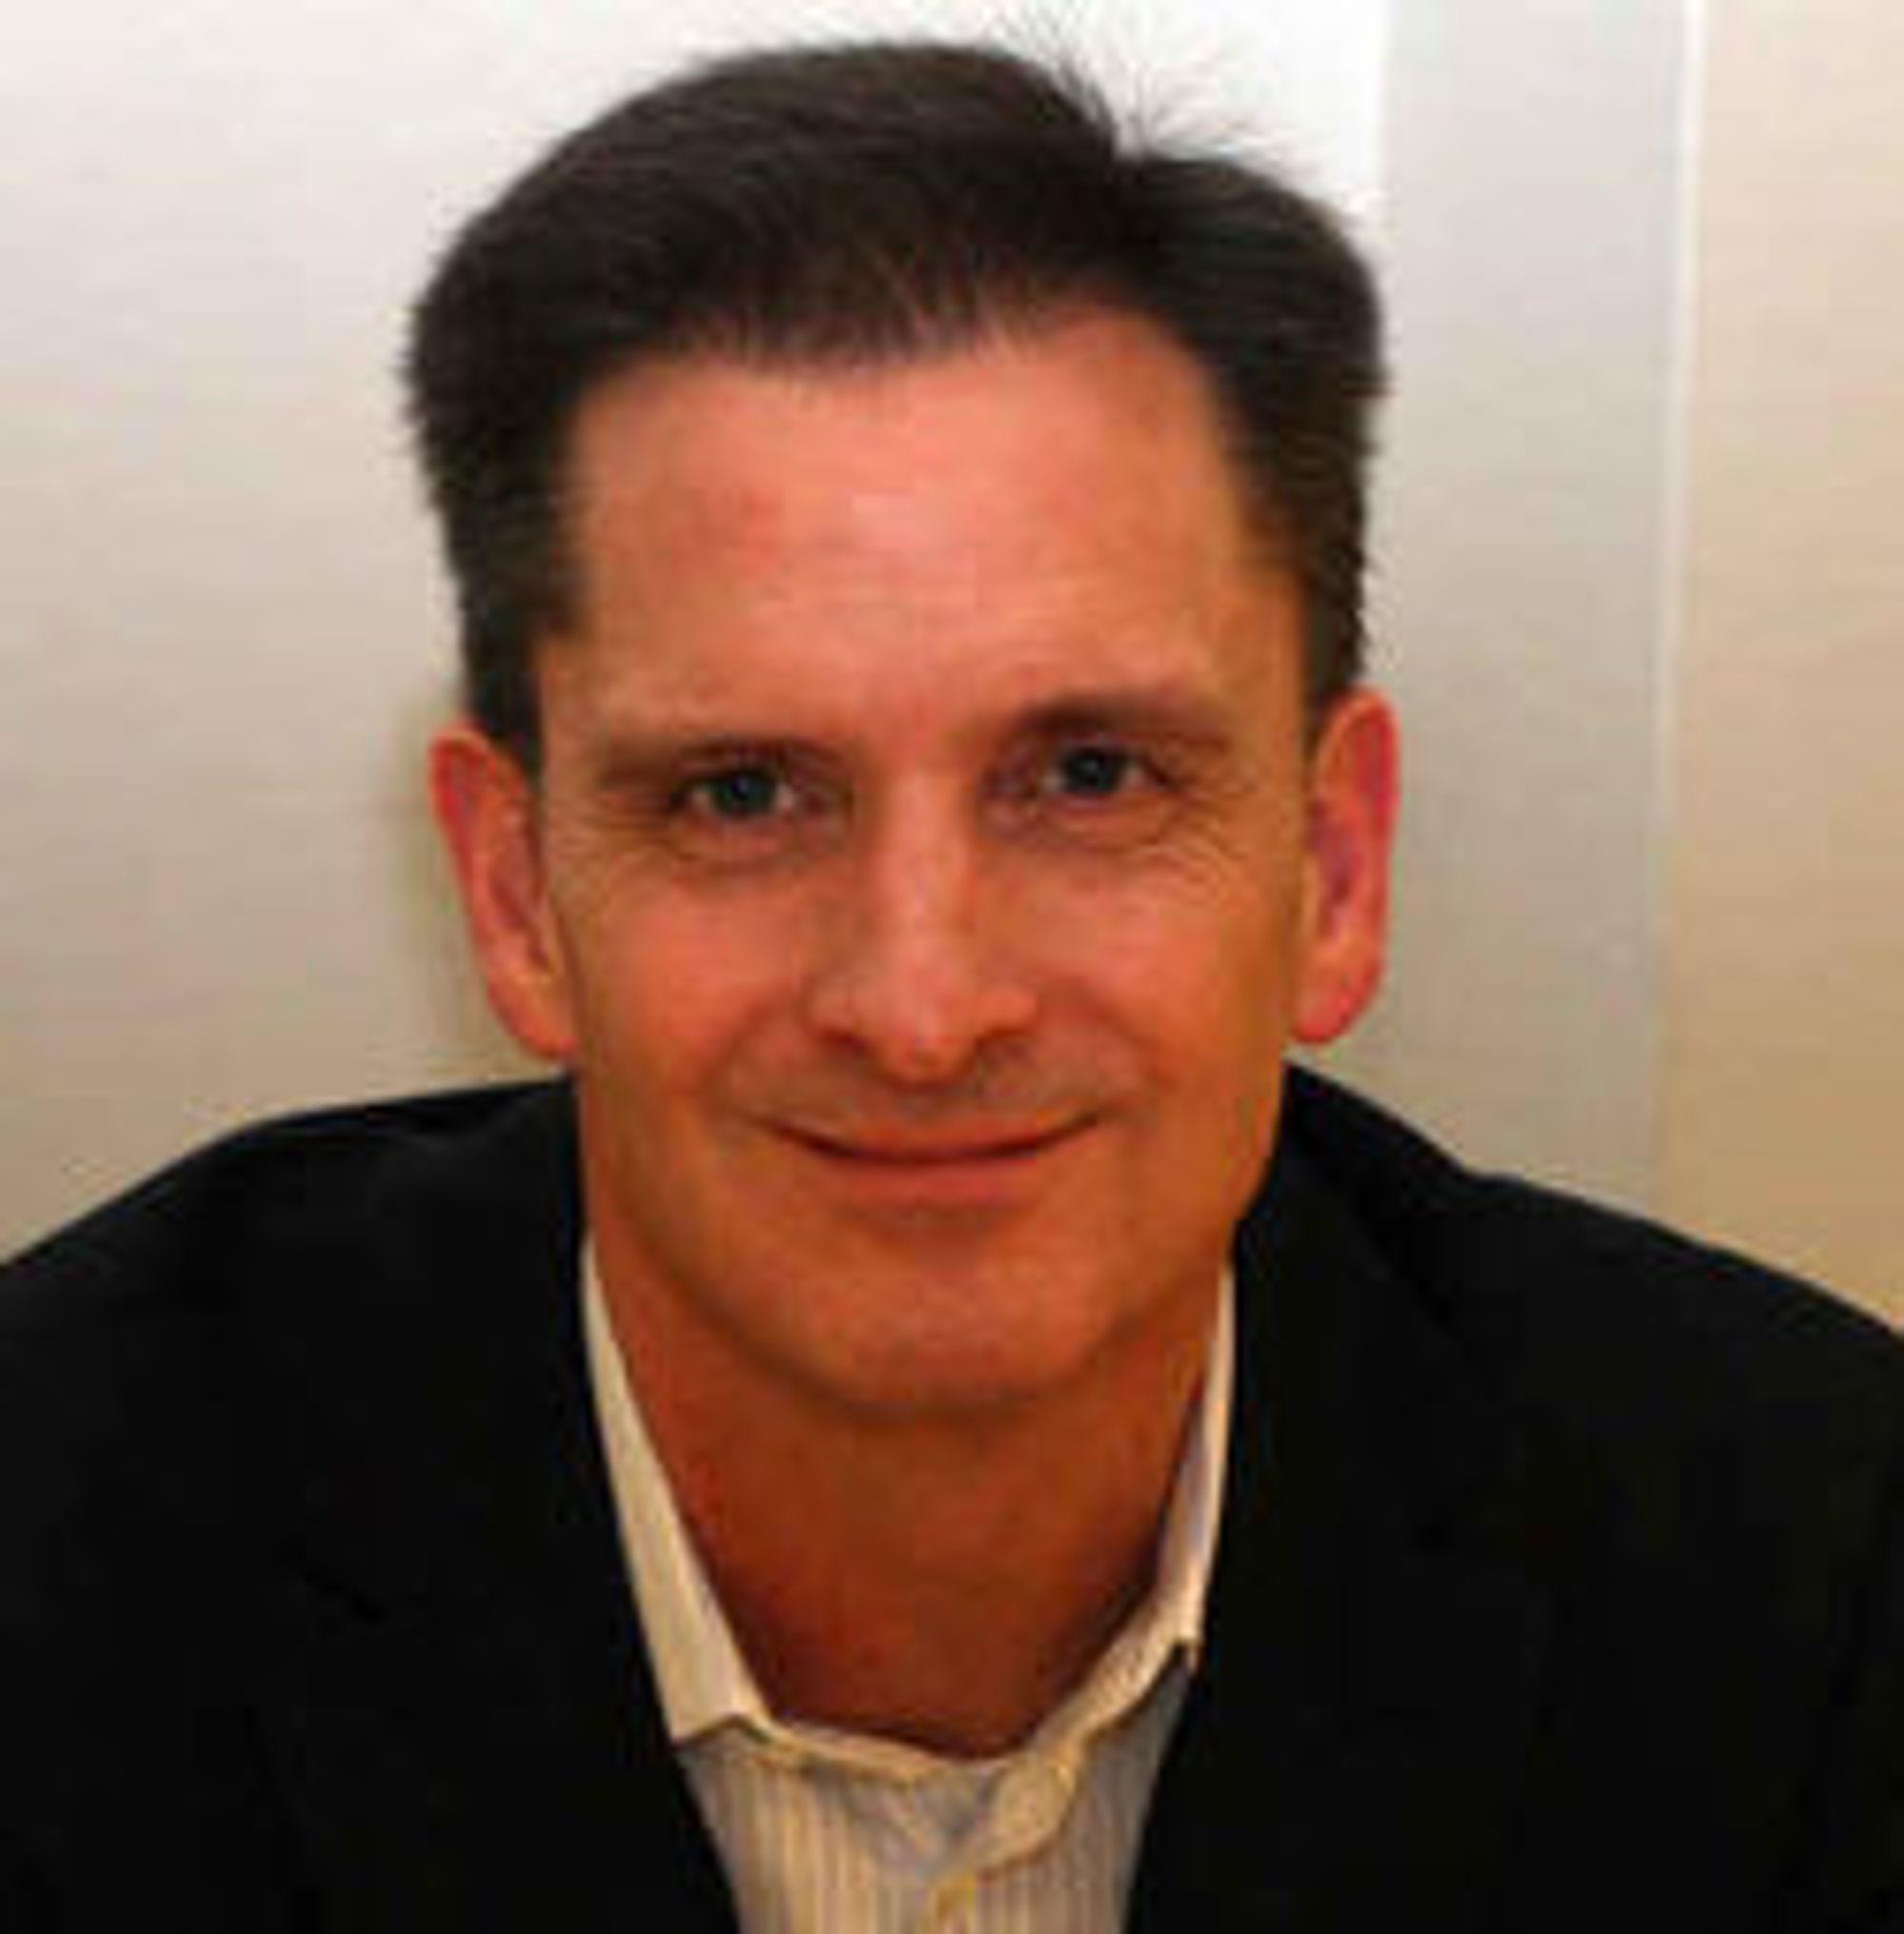 Markedssjef Eric Aarrestad fra Watchguard Technologies.